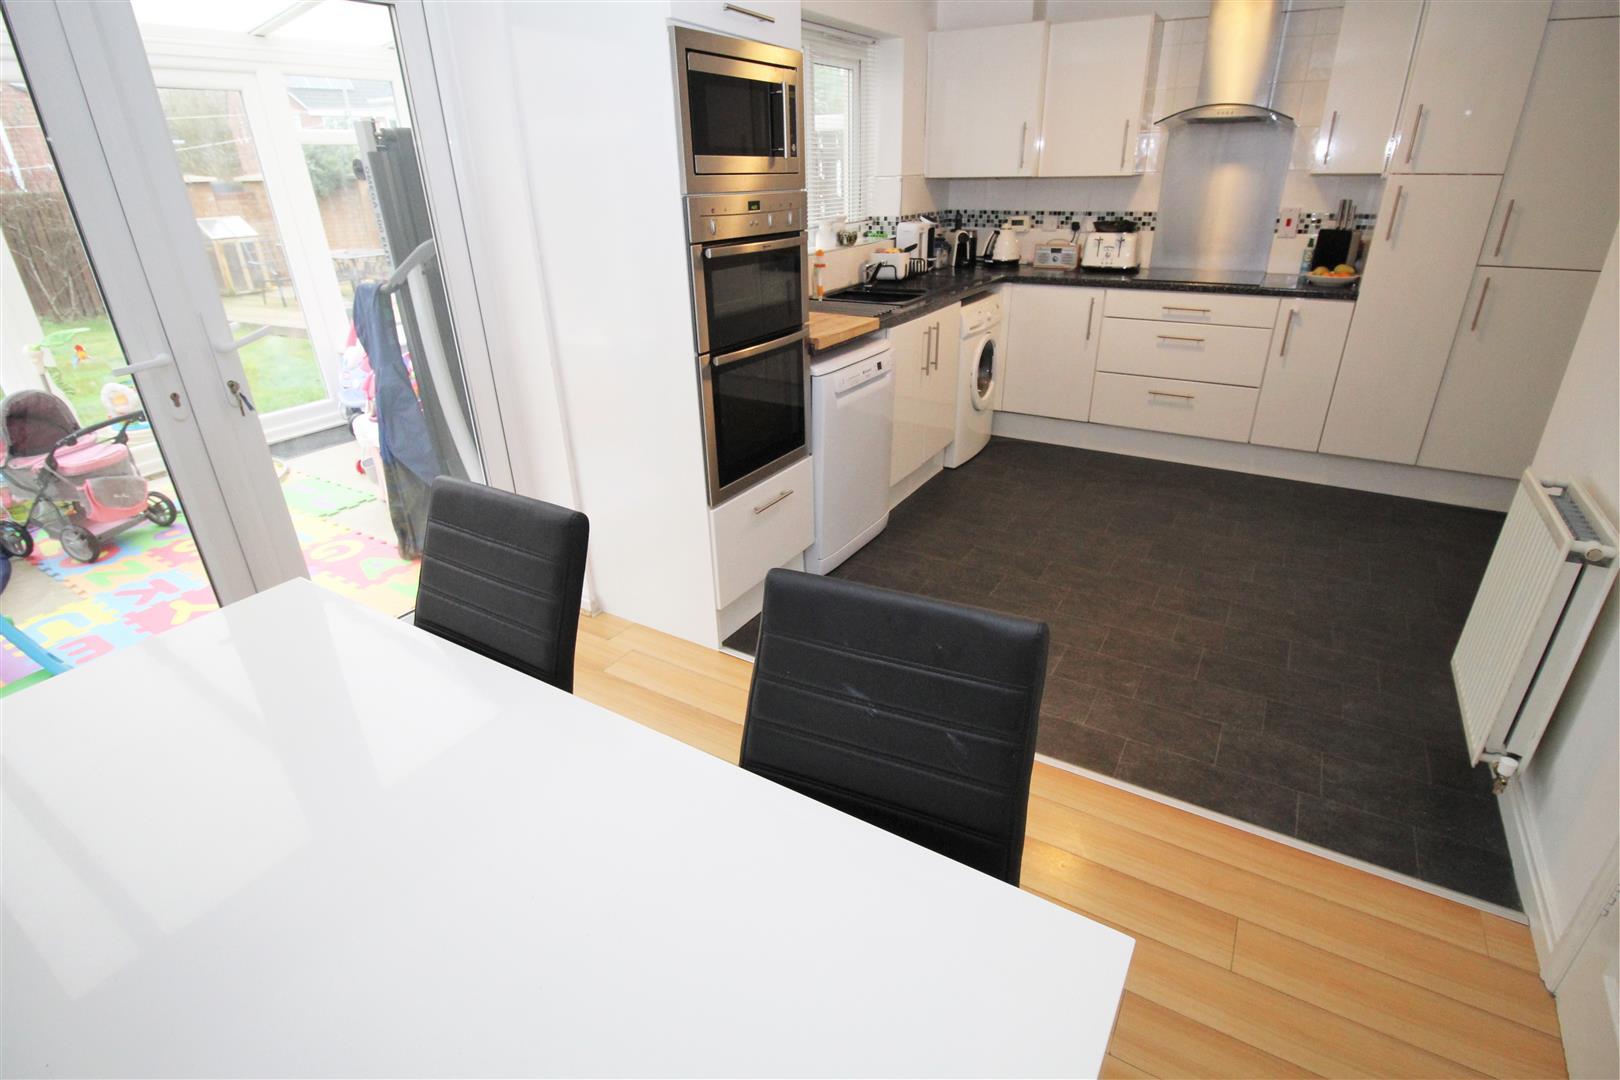 3 Bedrooms, House - Detached, Papillon Drive, Liverpool